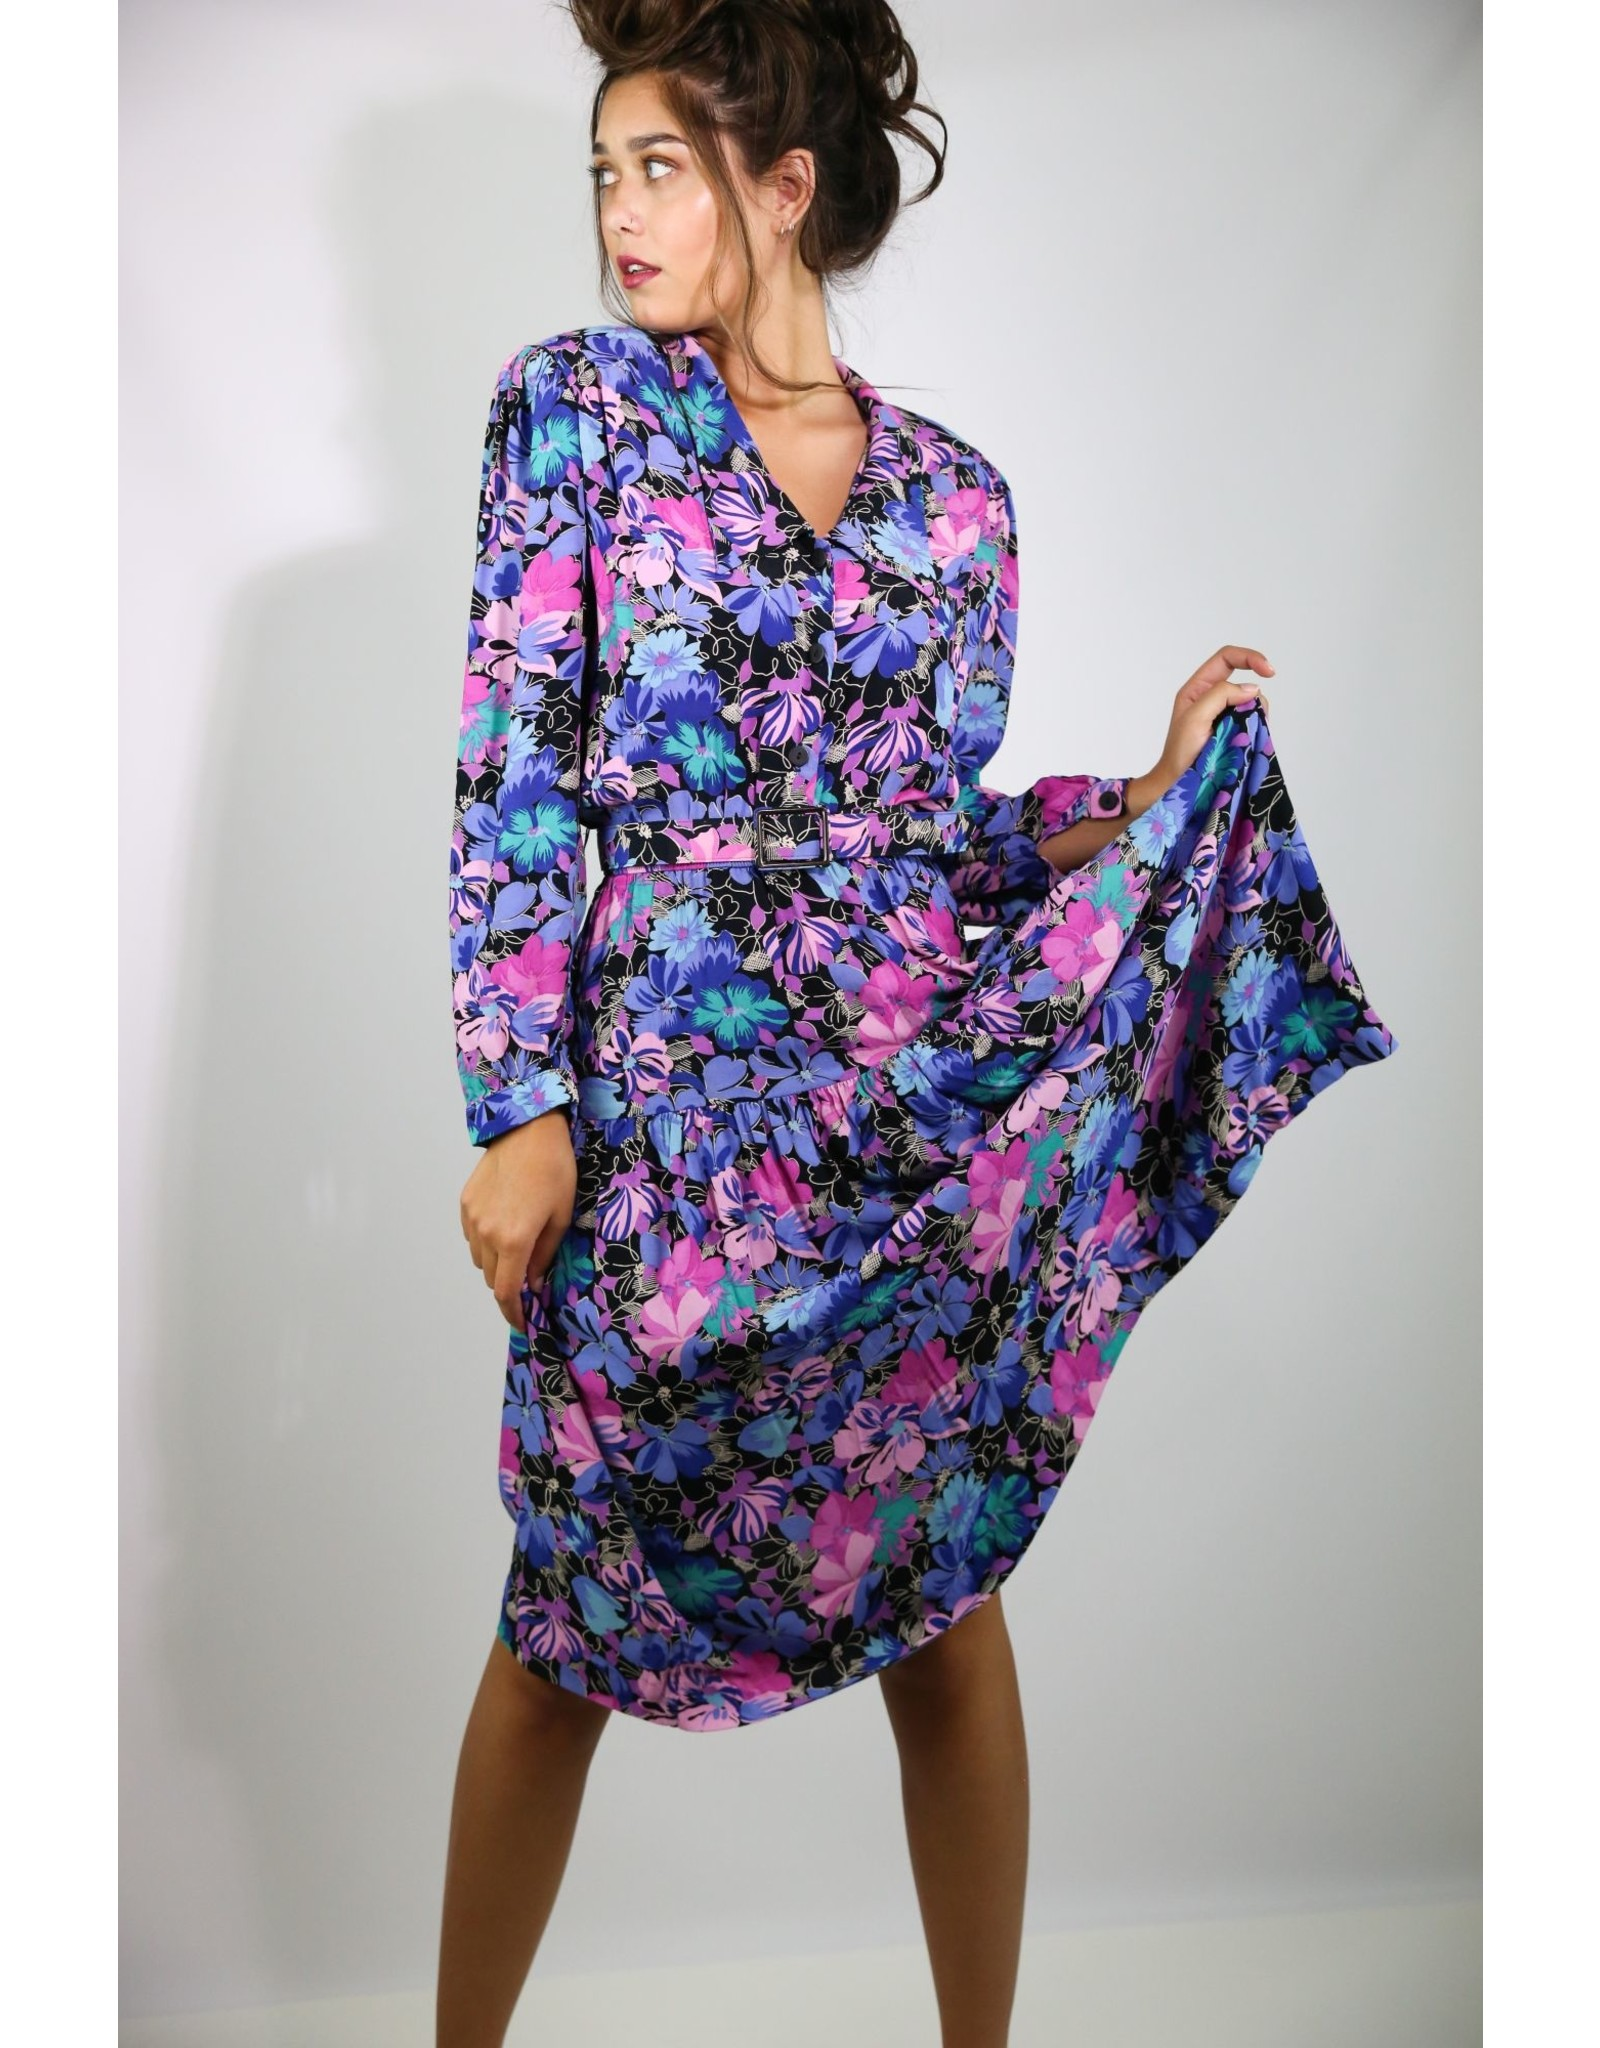 1980's Blue & Pink Floral Business Dress